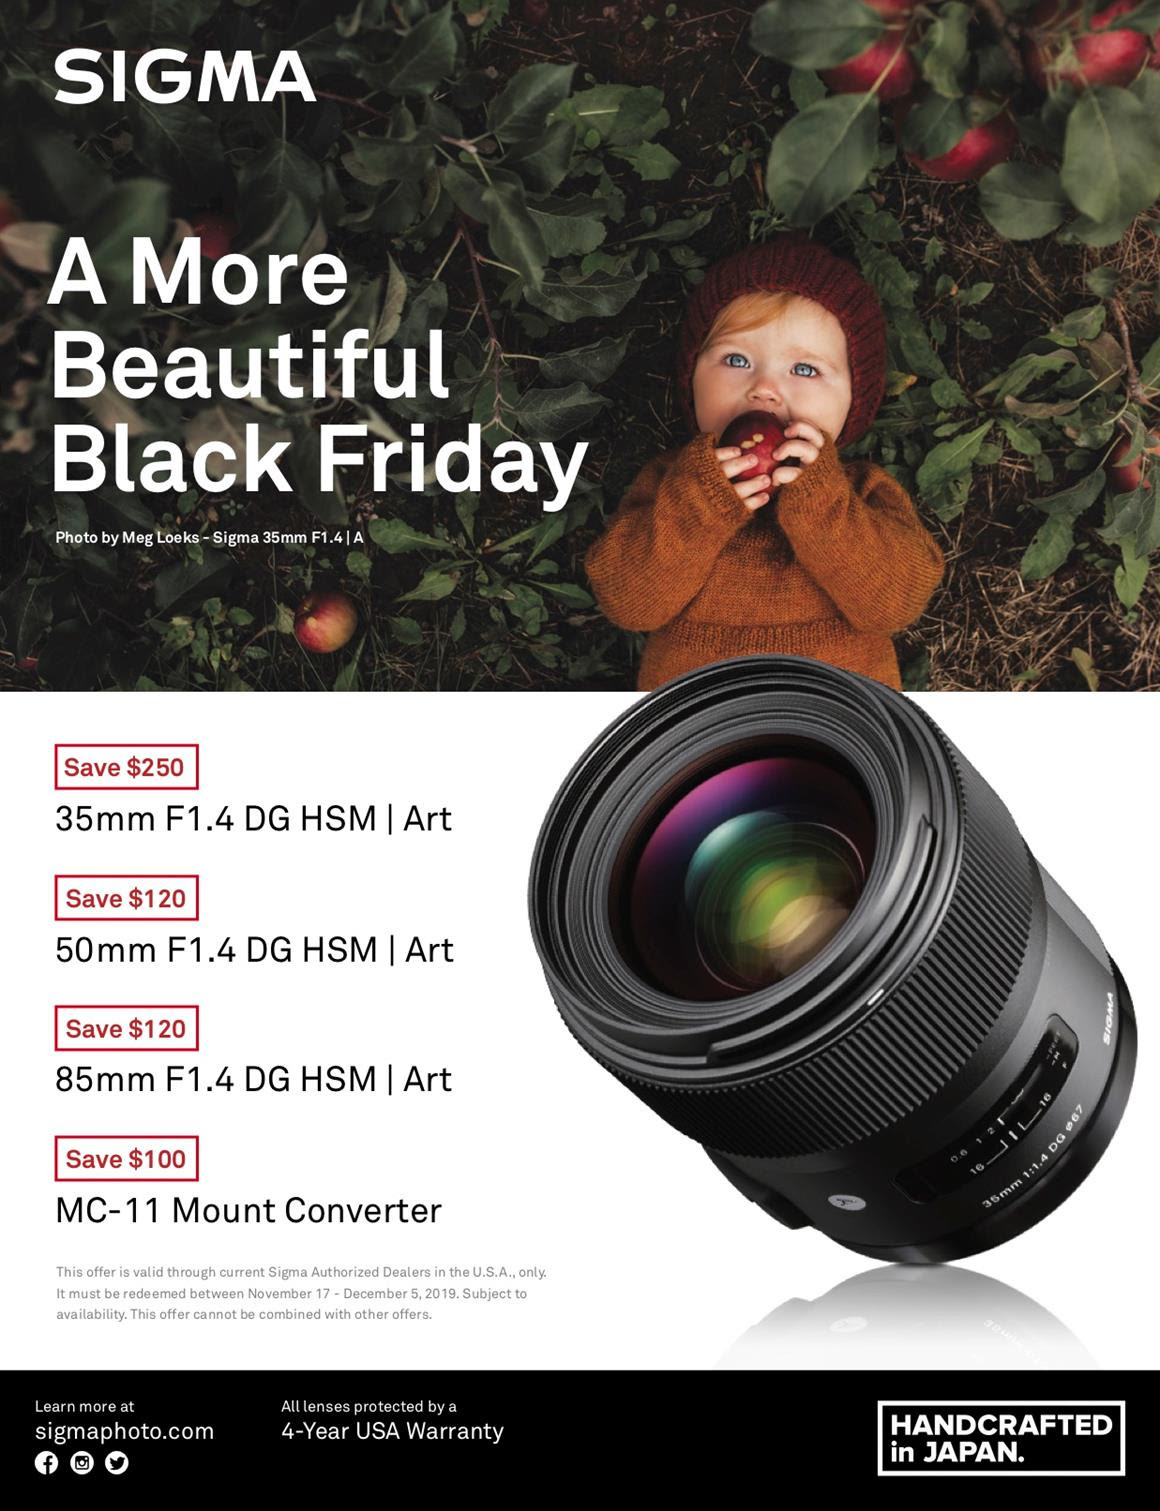 Sigma Black Friday Promotion